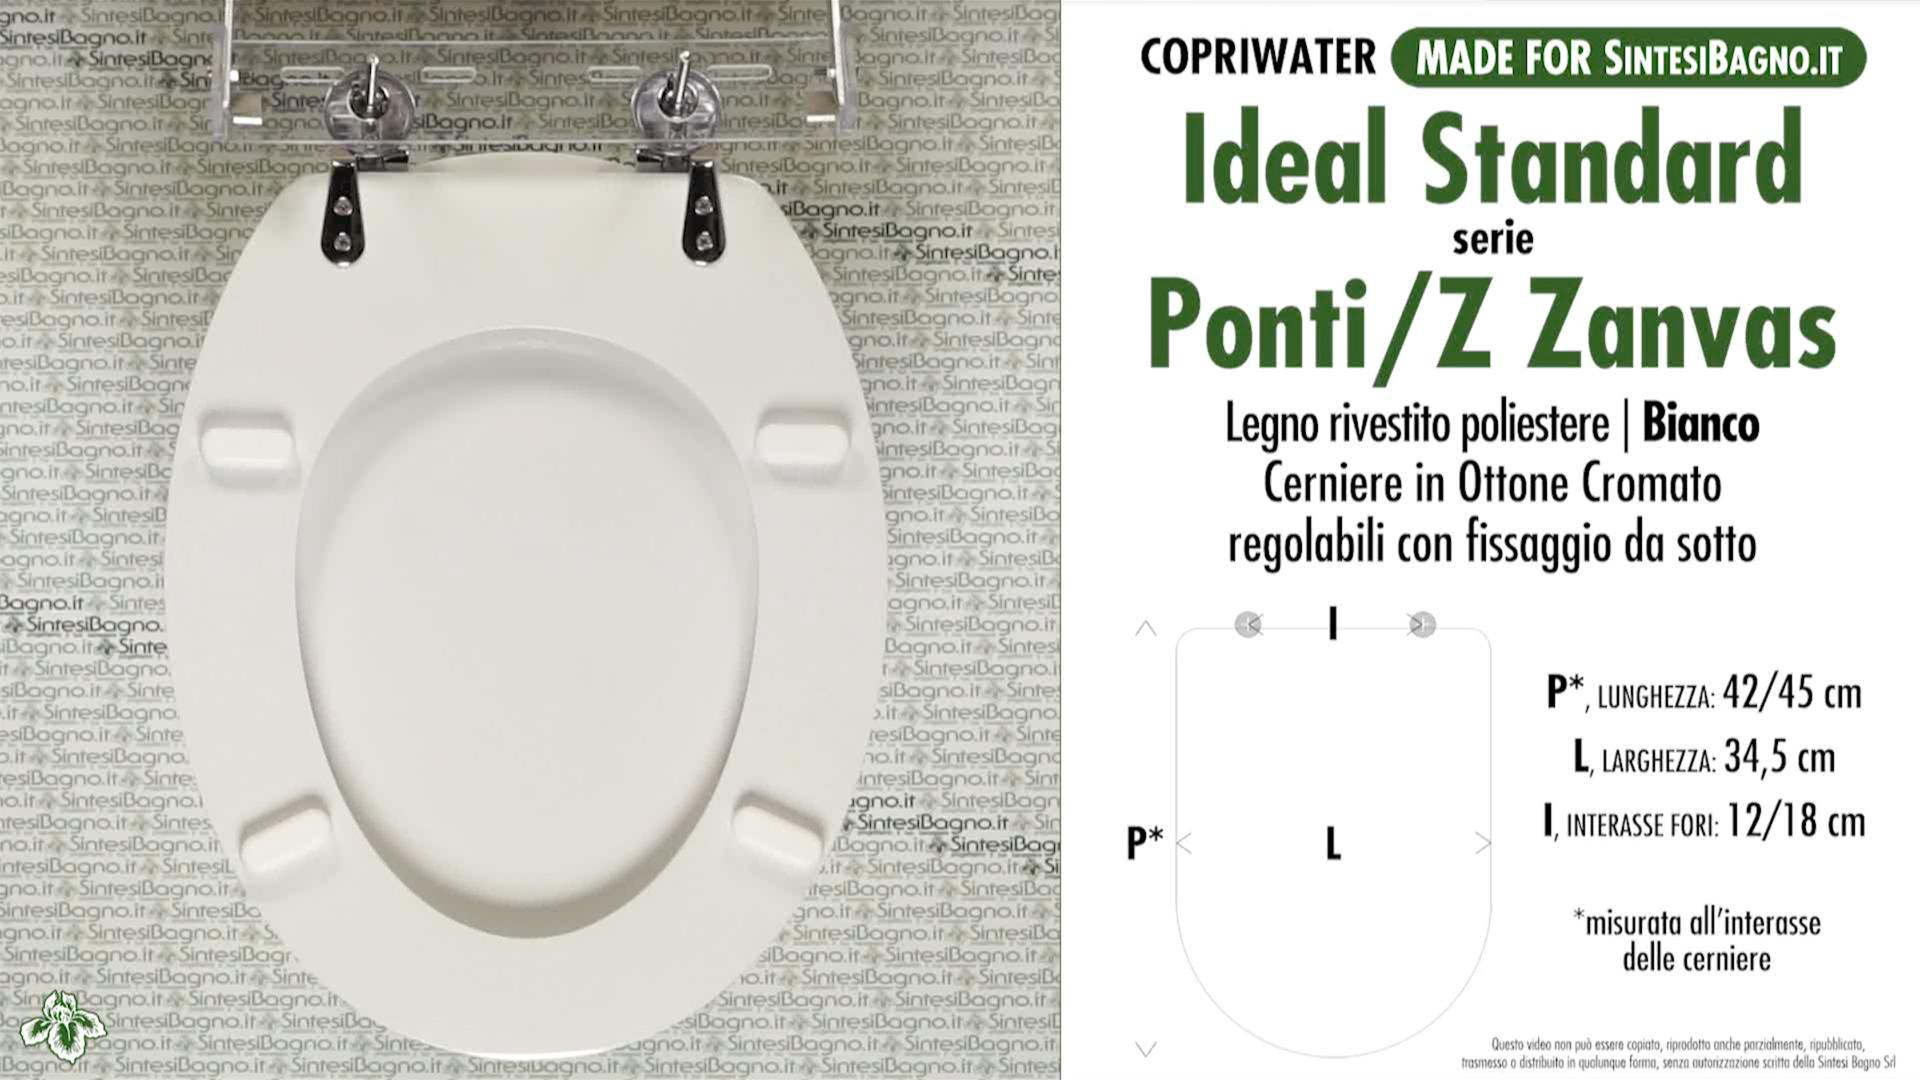 Copriwater Per Vaso Ponti Z Zanvas Ideal Standard Dilpontizeta Ebay